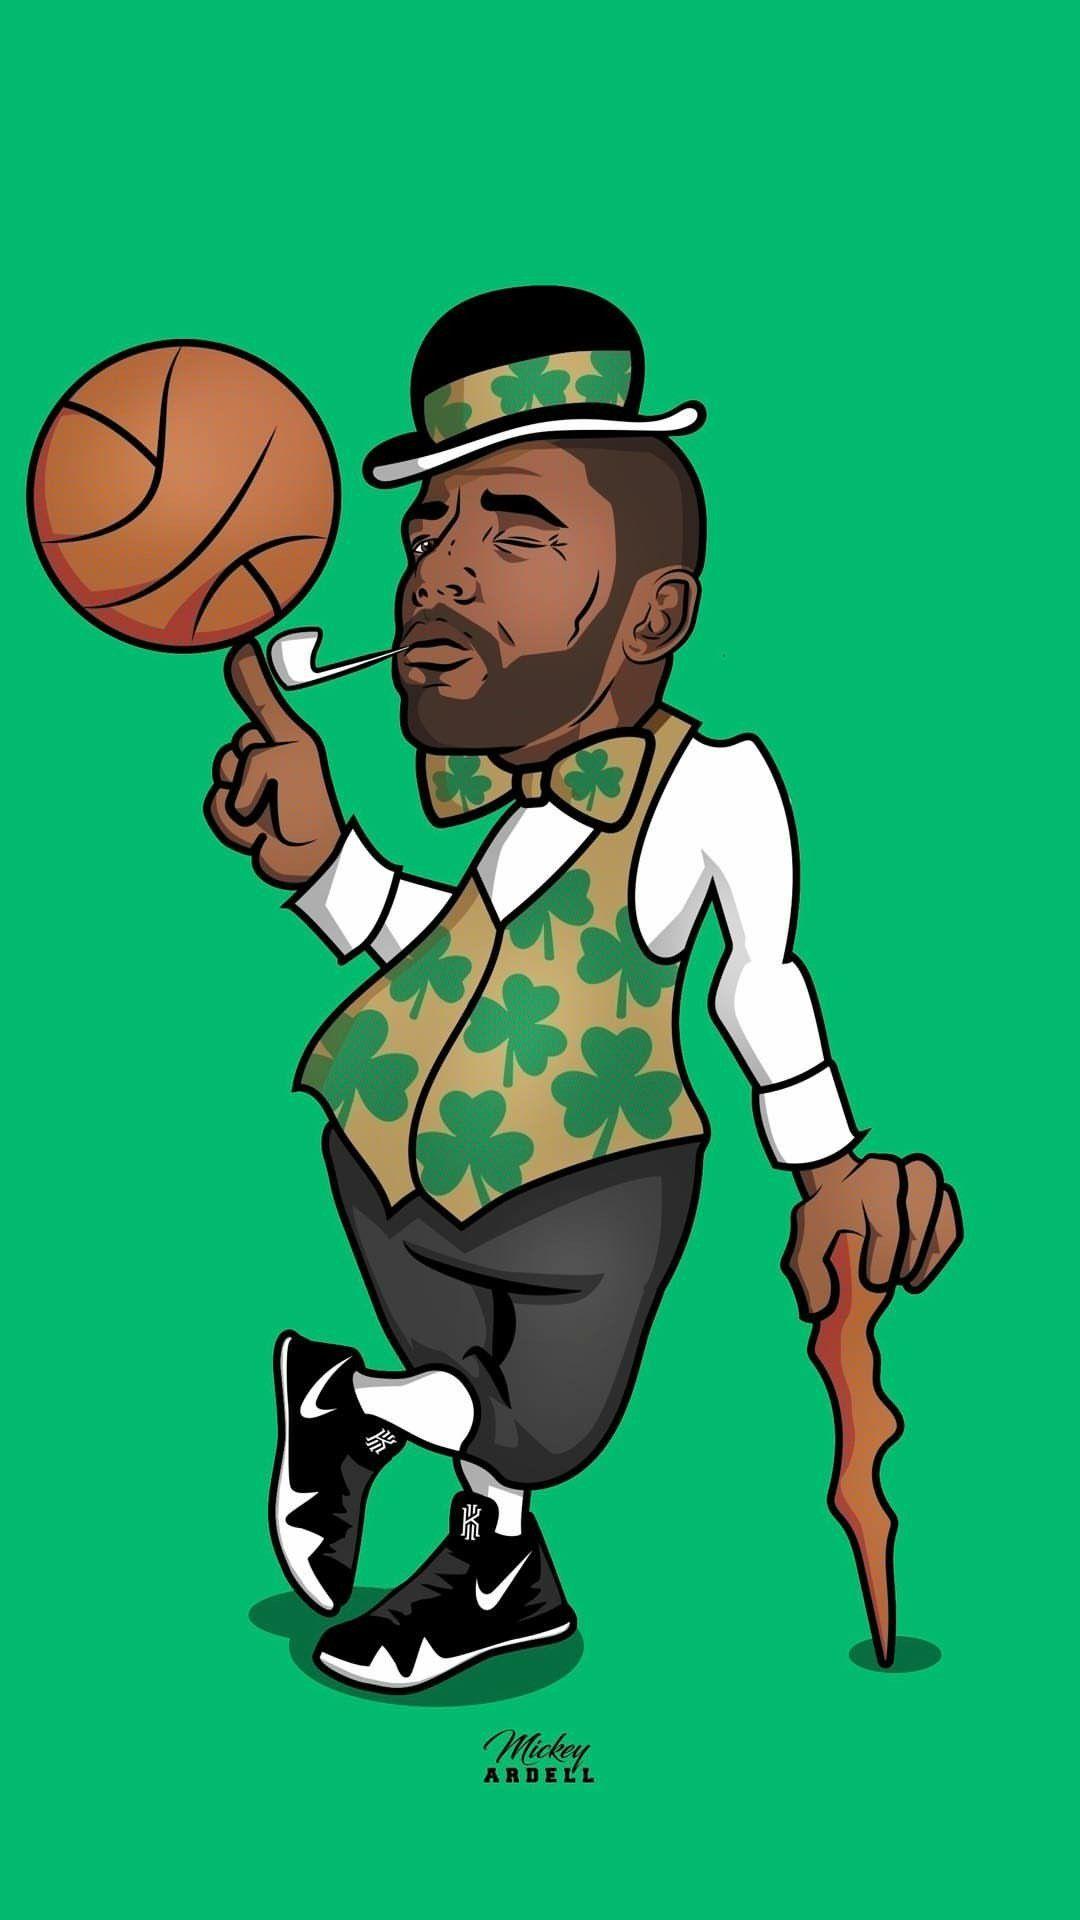 Kyrie Irving Boston Celtics Wallpaper Boston Celtics Wallpaper Irving Wallpapers Kyrie